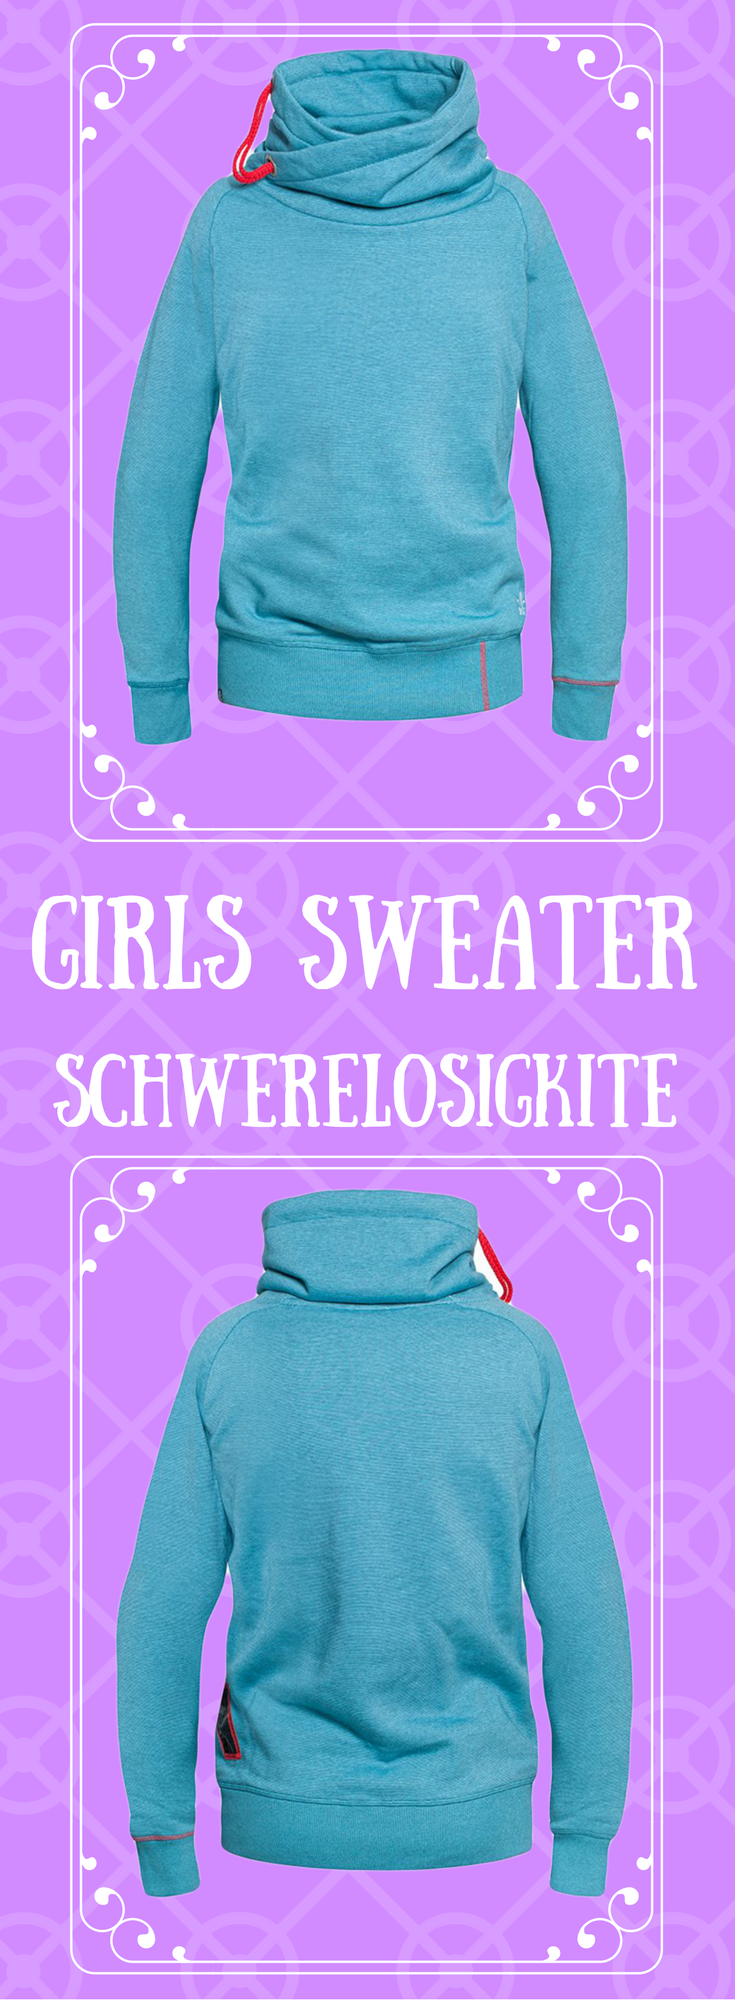 Girls Sweater | SWLK | Kitesurf Klamotten Kiteboarding